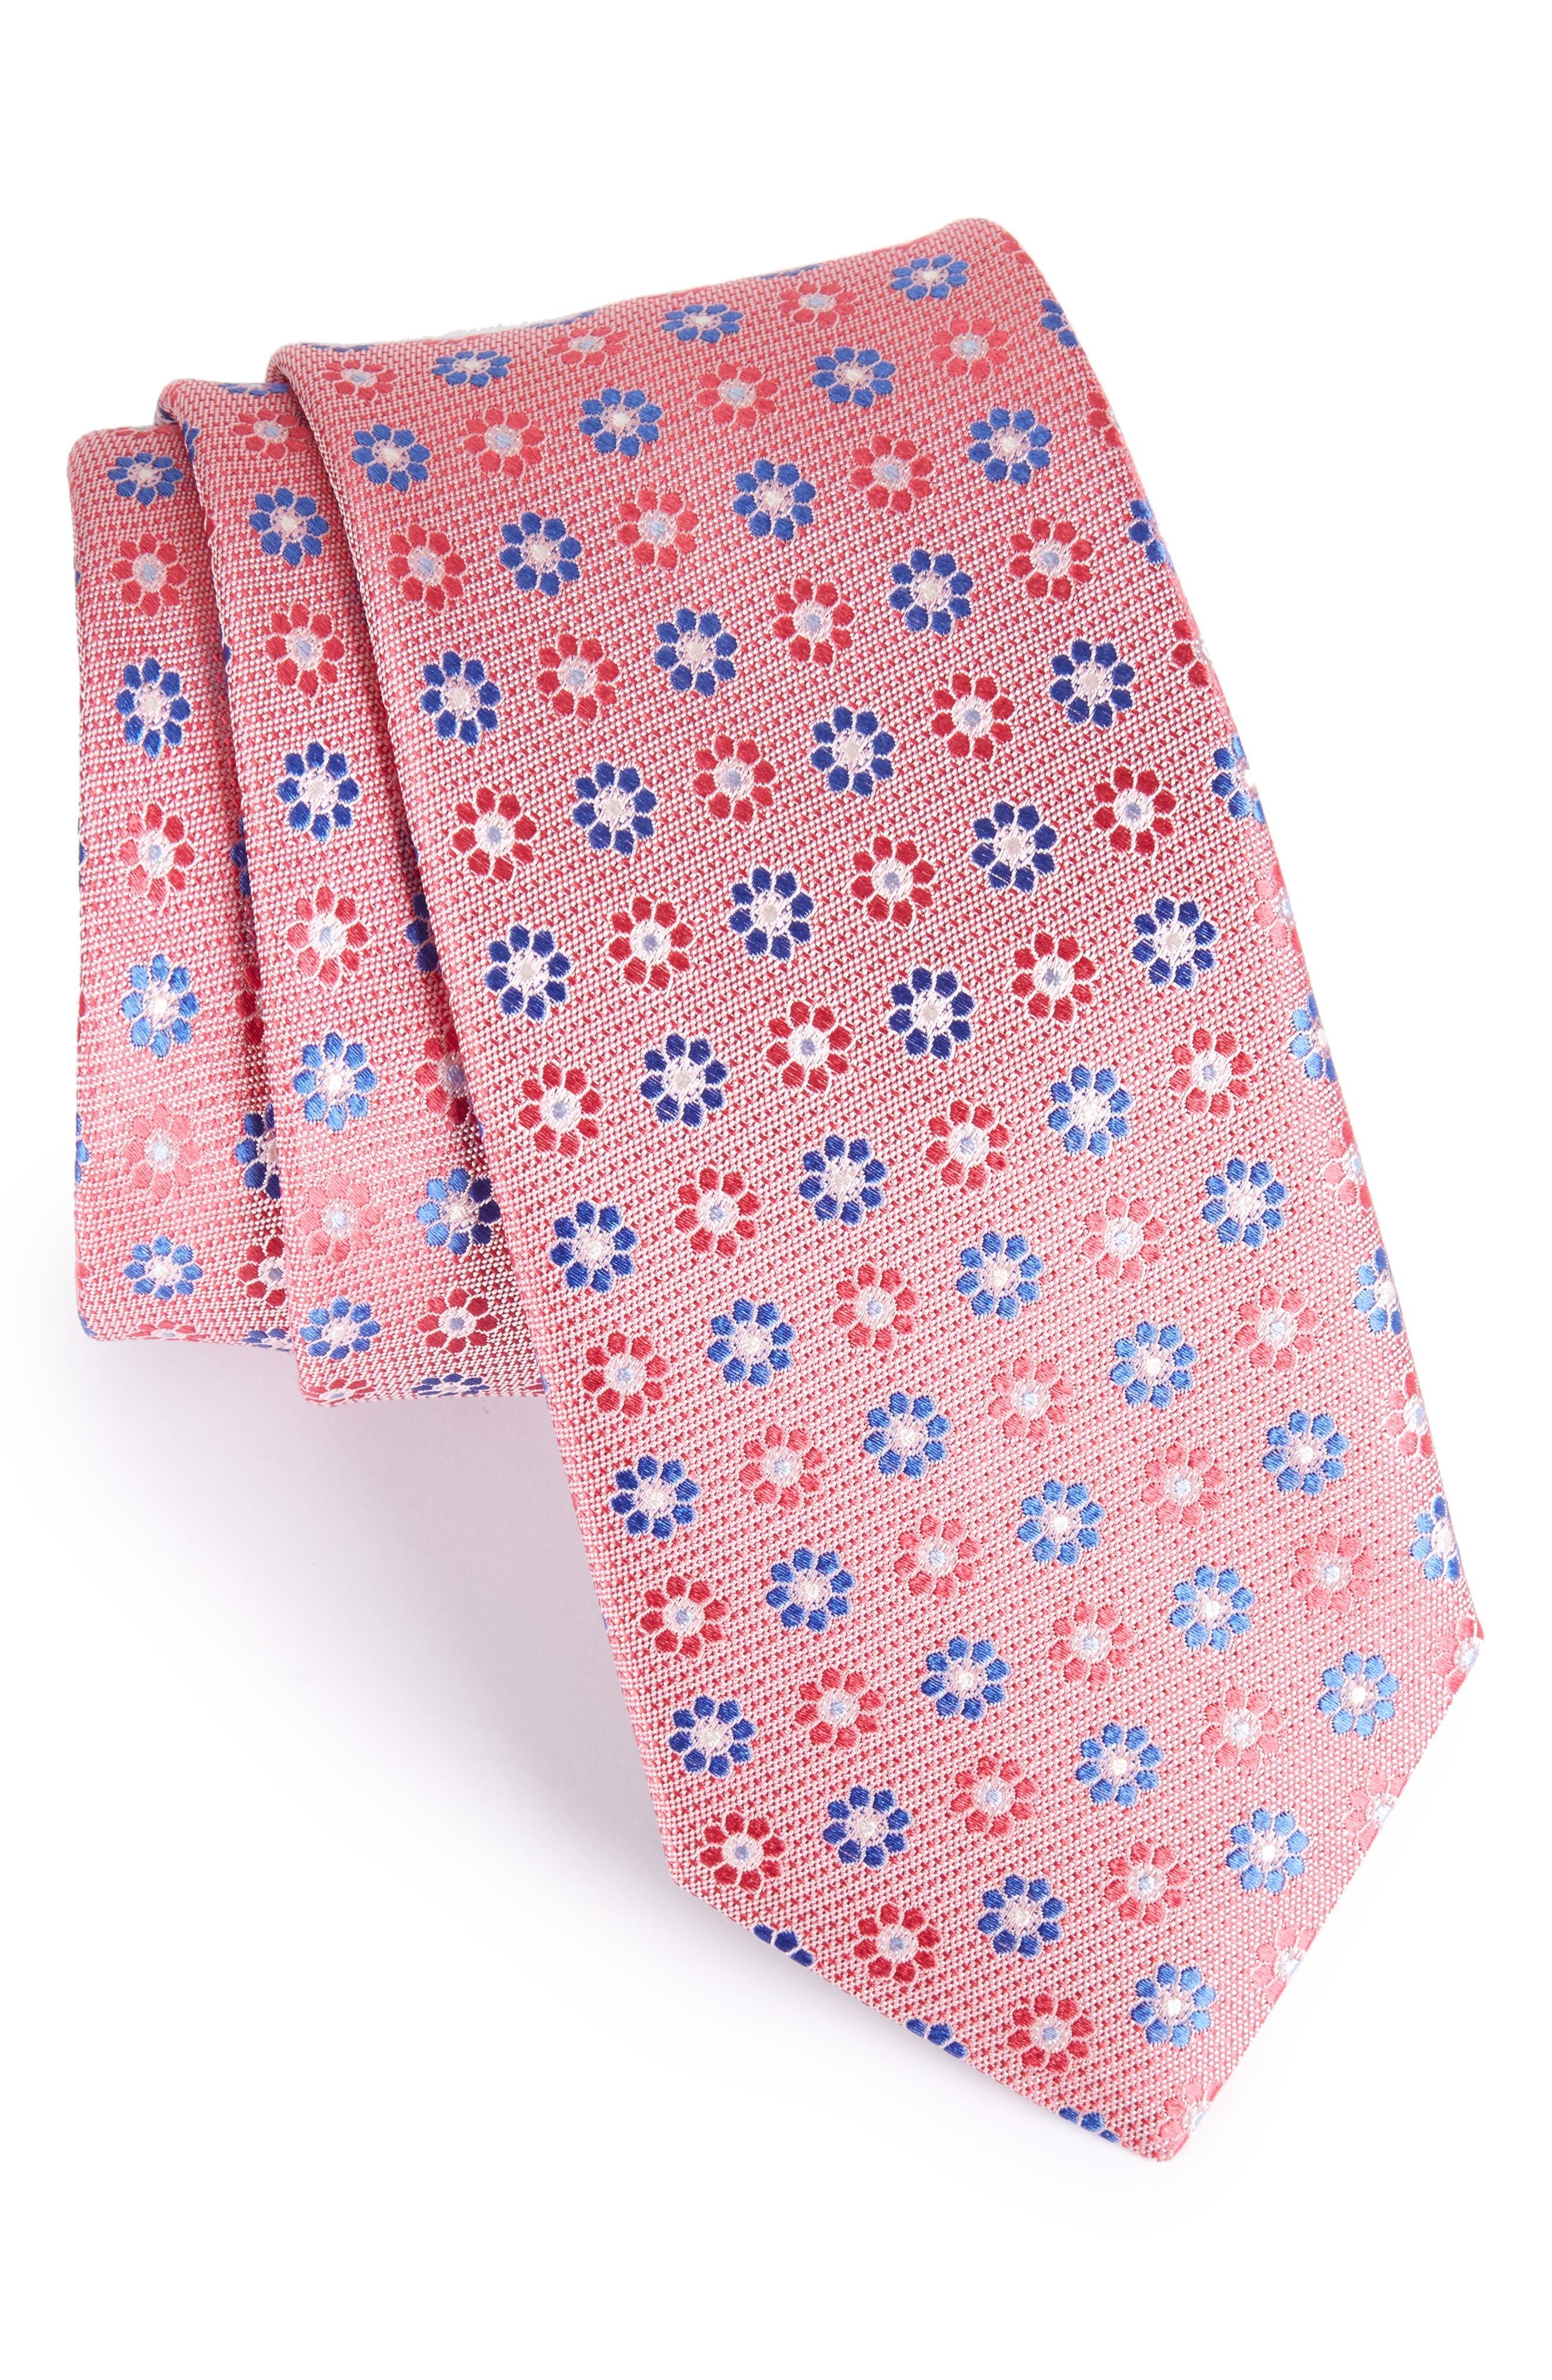 John W. Nordstrom Floral Silk Tie,                             Main thumbnail 5, color,